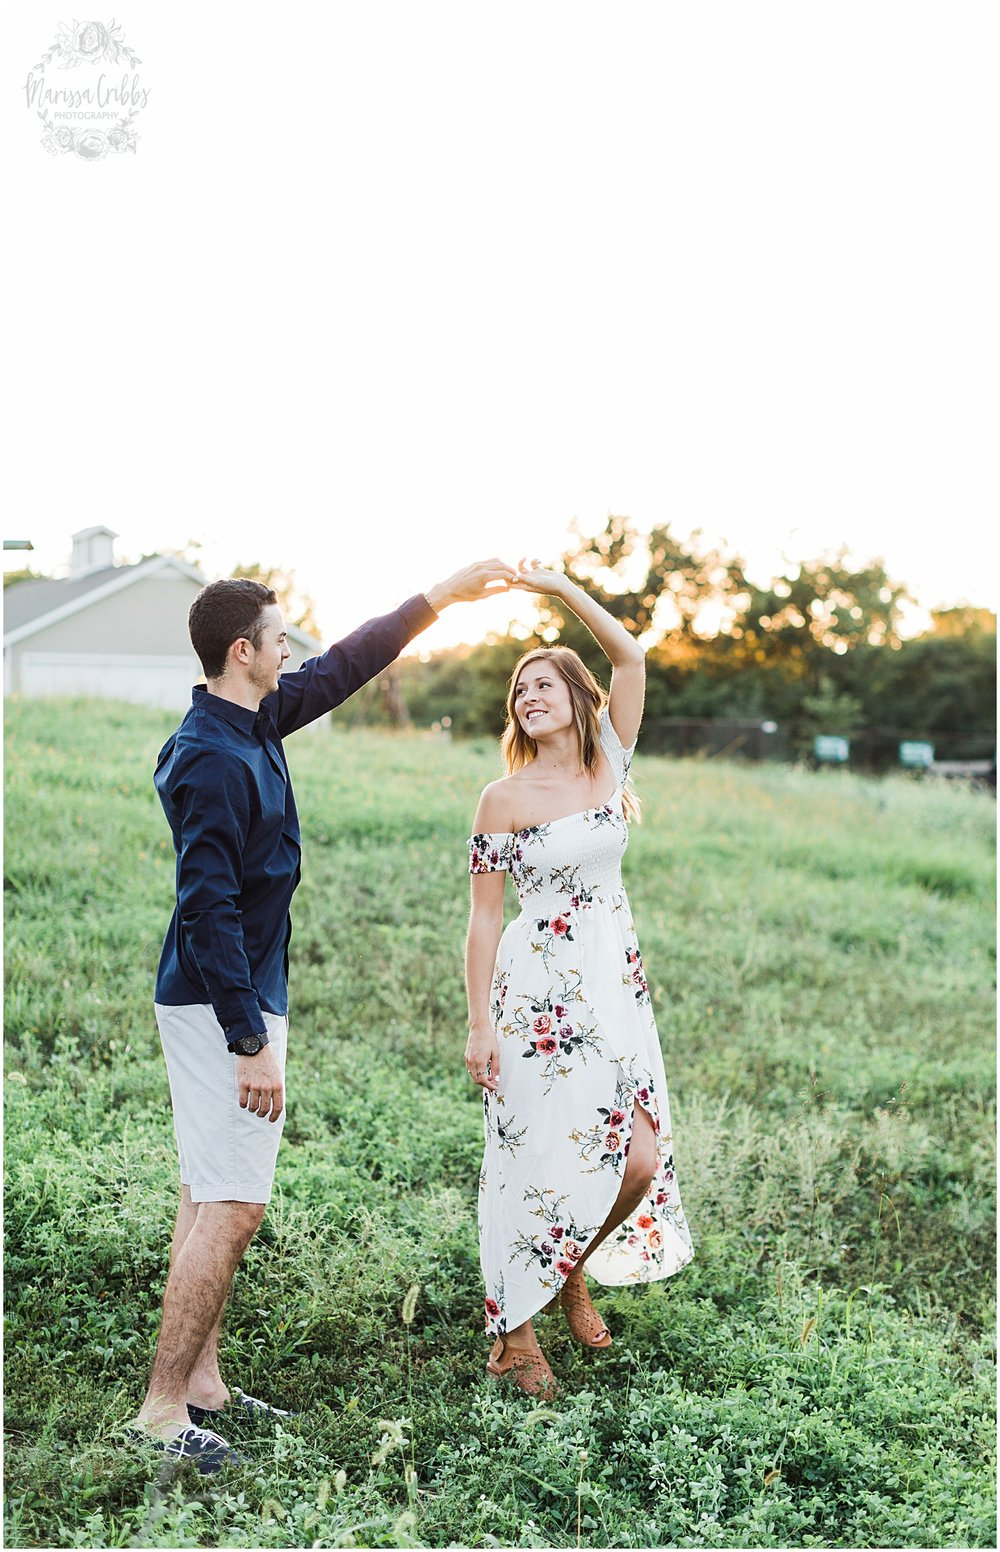 Leah & AJ Engagement | Marissa Cribbs Photography_6212.jpg